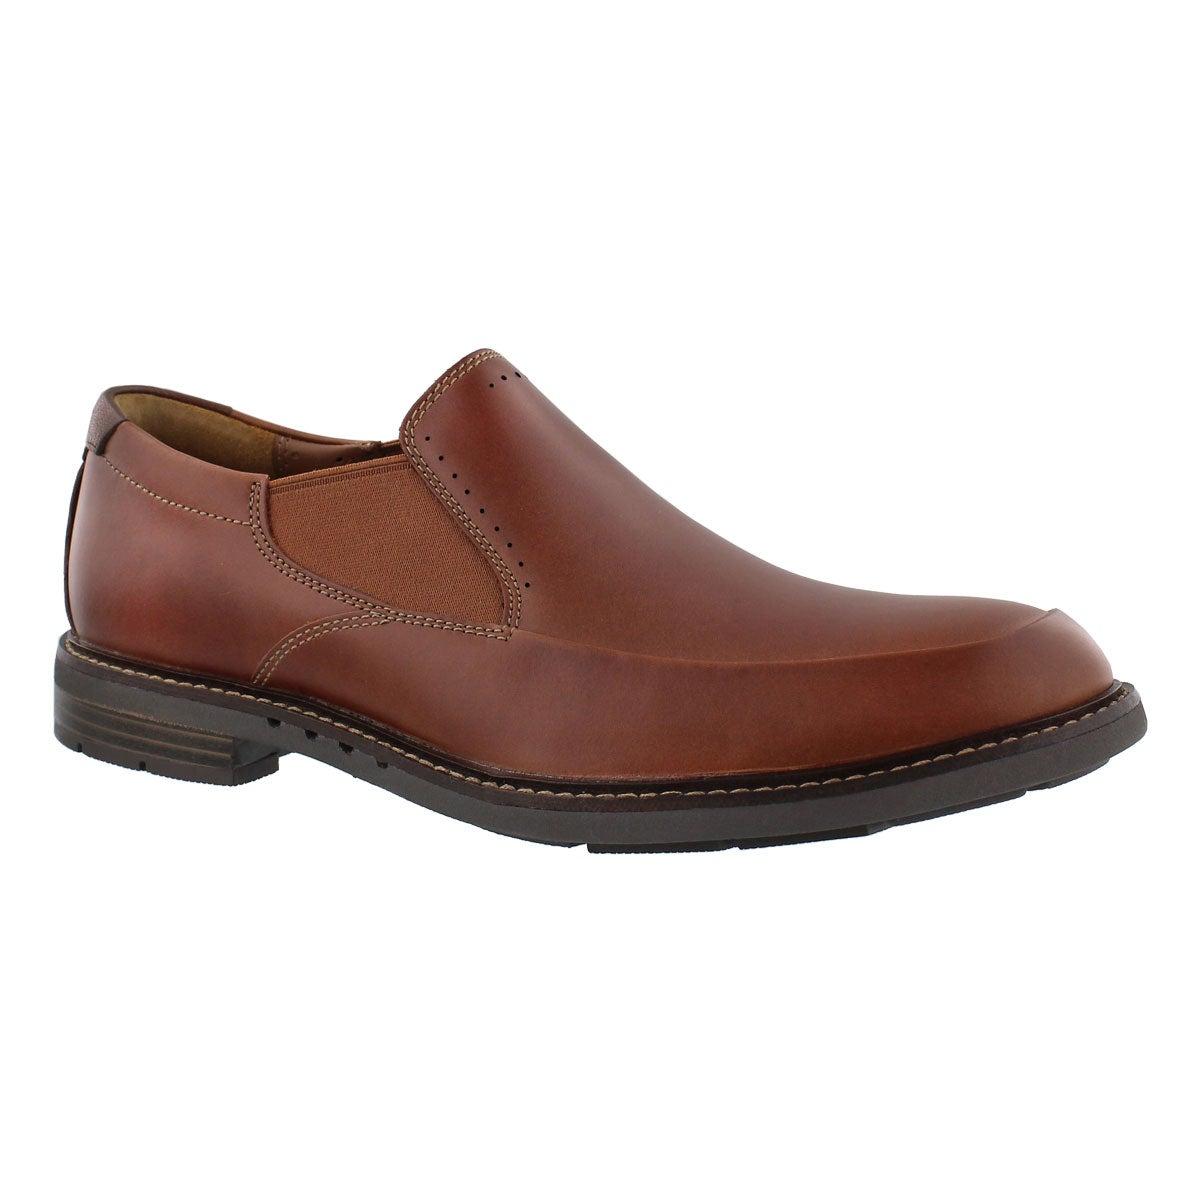 Mns Un.Ellot Step tan slip on dress shoe